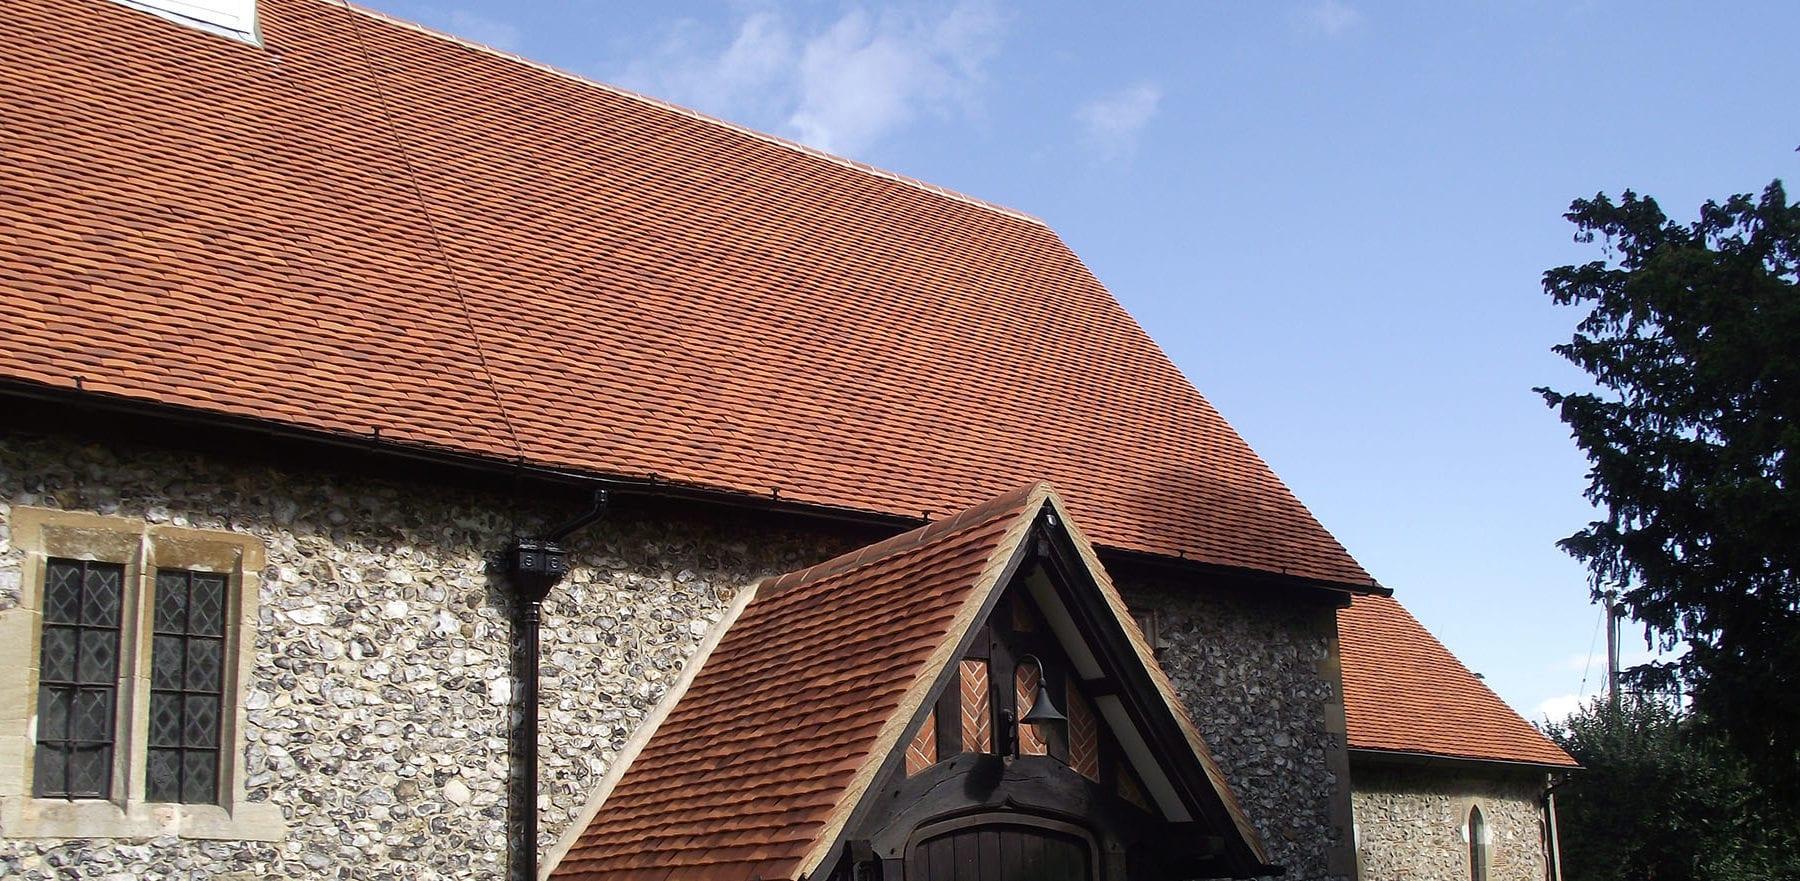 Lifestiles - Handmade Orange Clay Roof Tiles - Sulhampstead Abbot, England 5